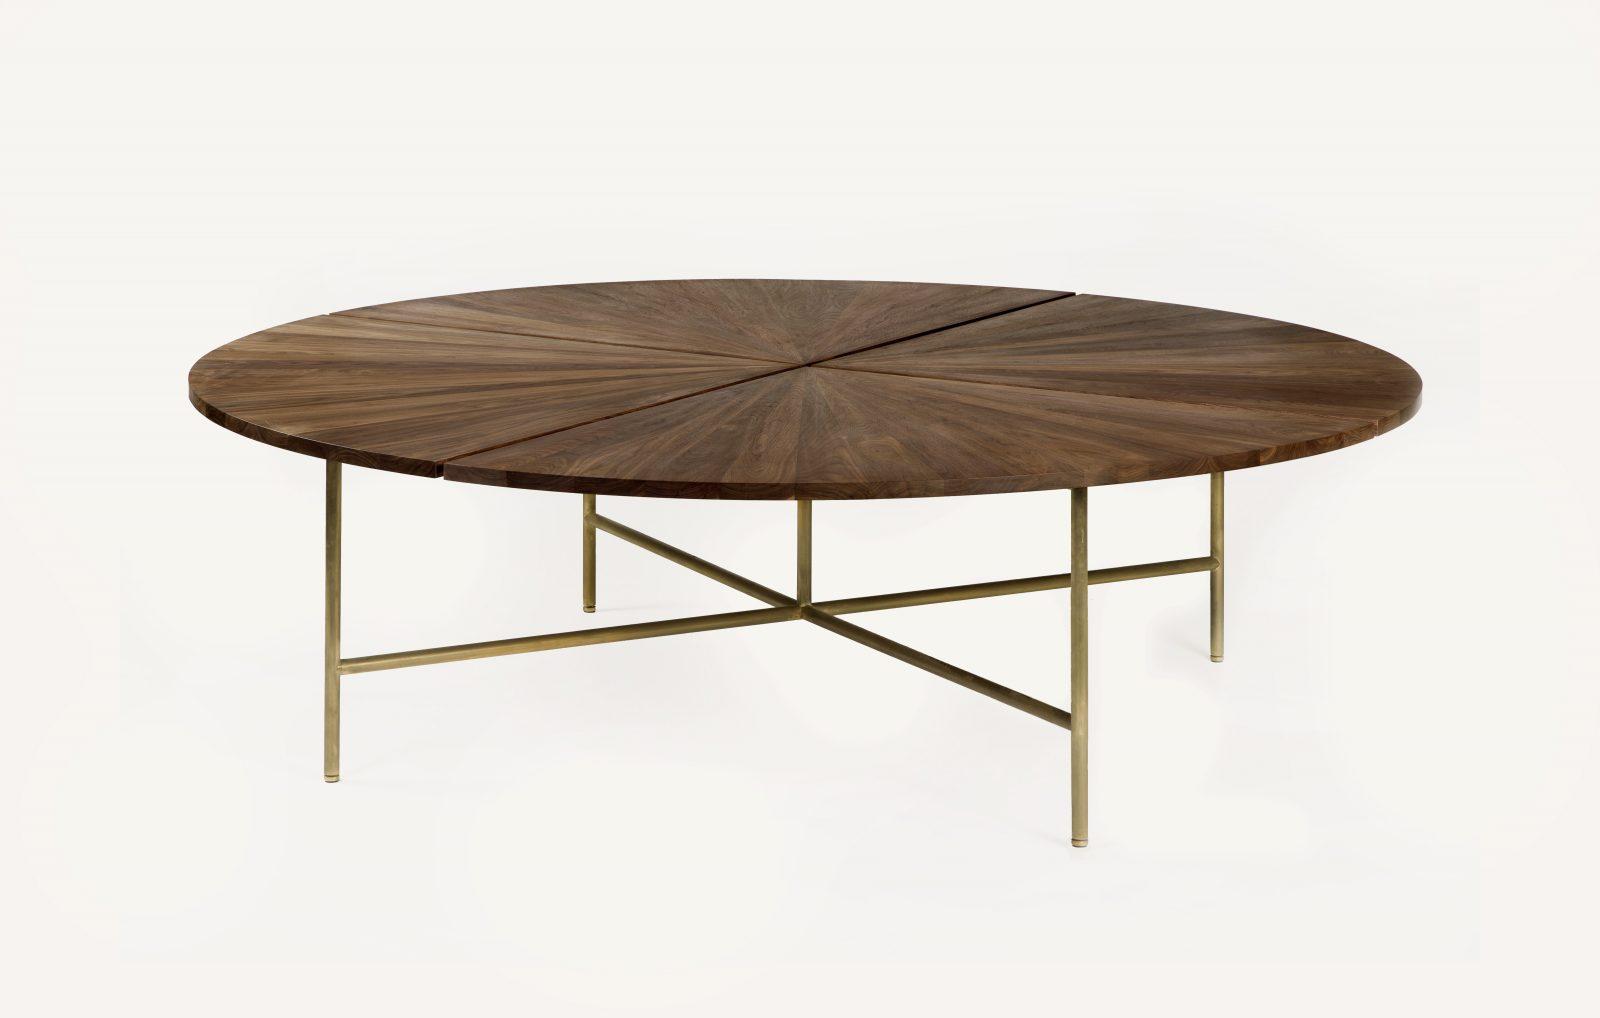 BassamFellows CB-38-240 Circular Dining Table Grand in solid Walnut and oxidized brass base, credit ELDON ZIMMERMAN